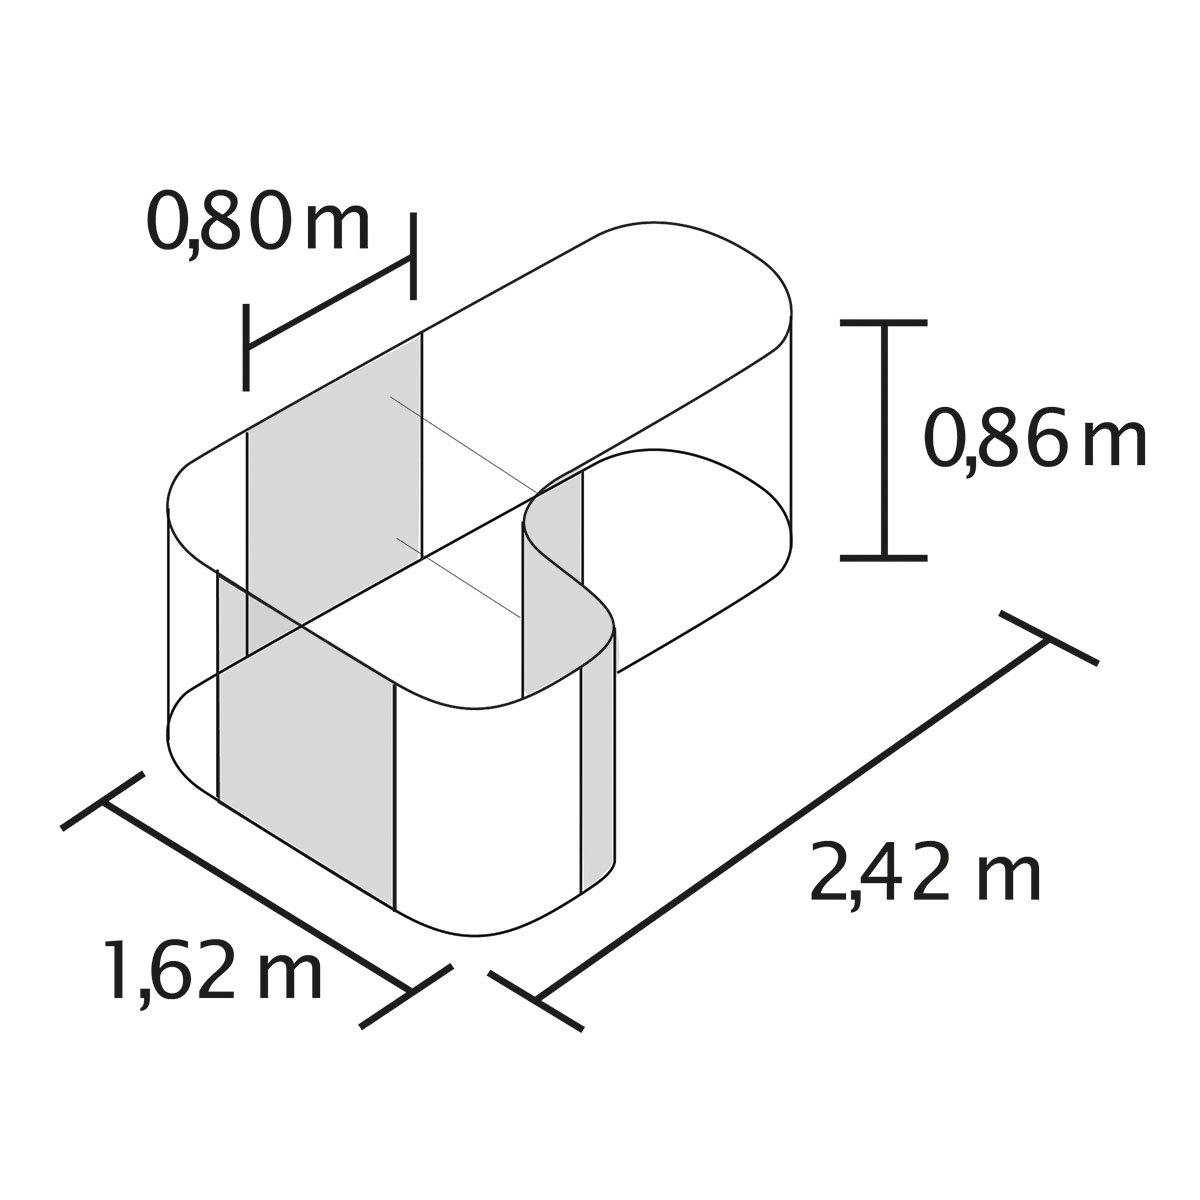 Vitavia Hochbeet Erweiterung Curve, aluminium | #2